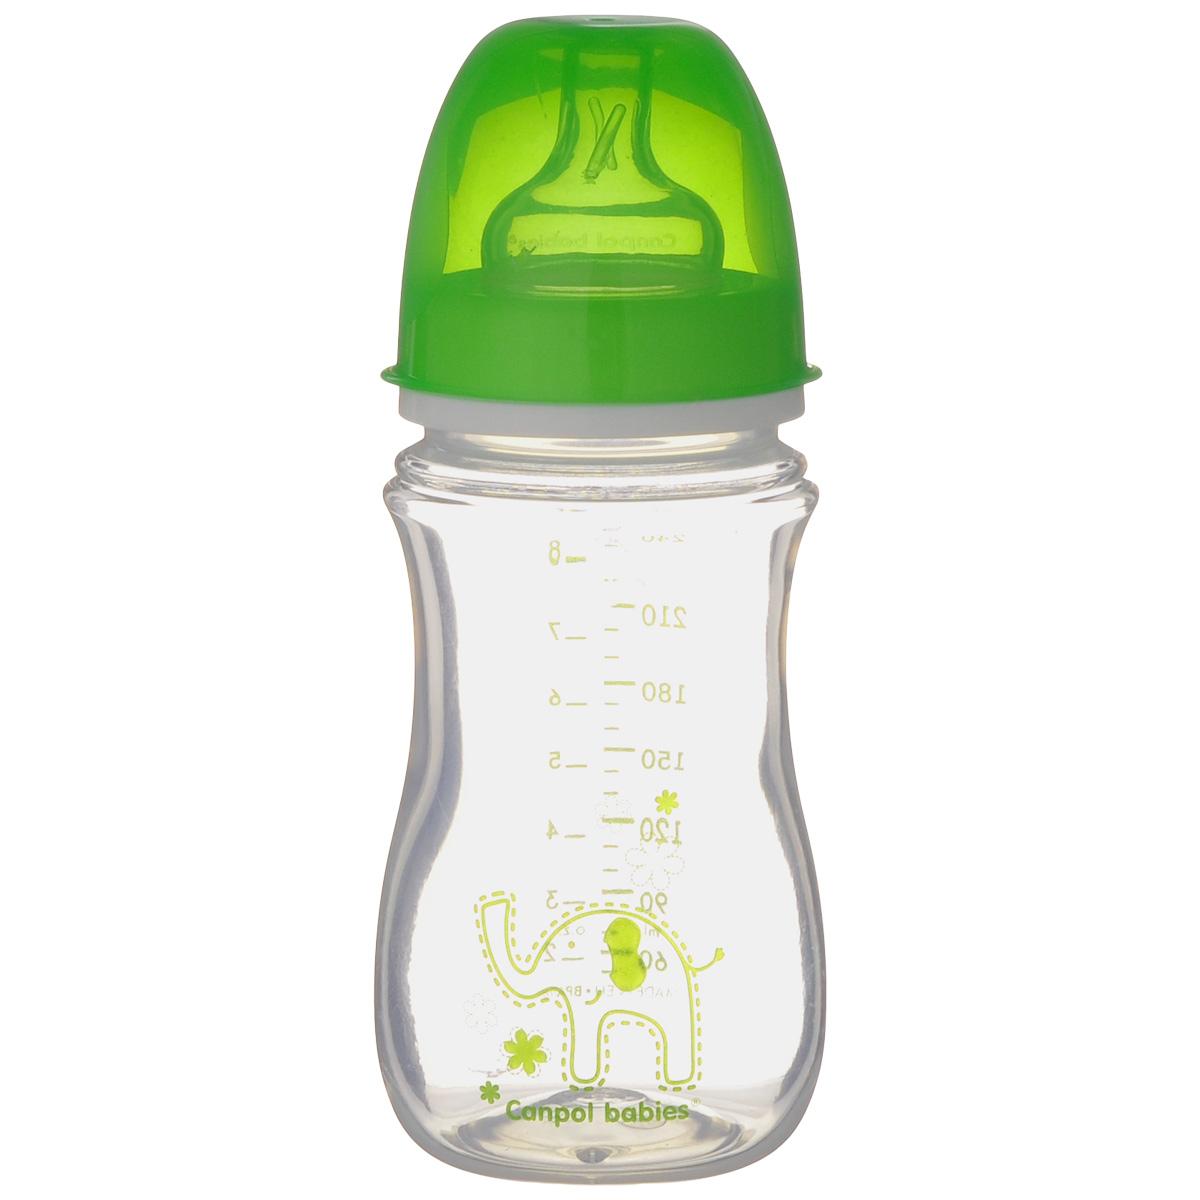 Canpol Babies Бутылочка антиколиковая Easy Start цвет зеленый 240 мл 35/206_зеленый